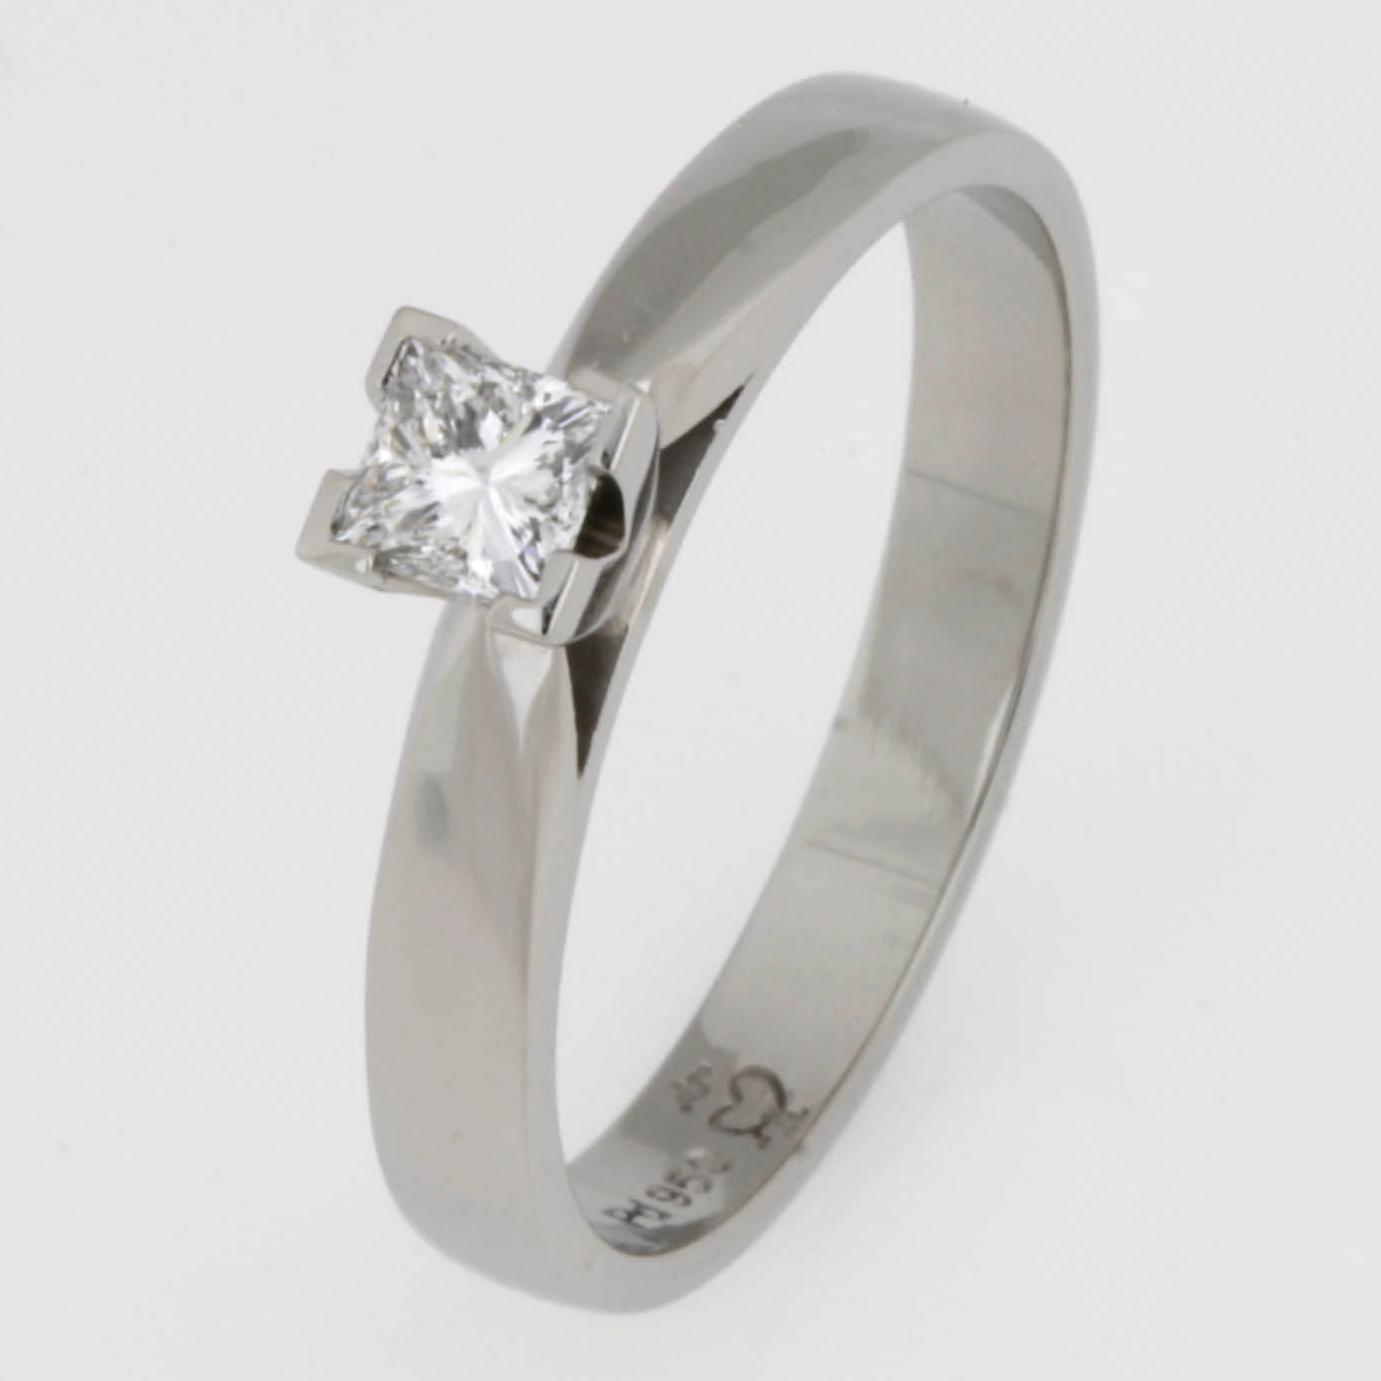 Handmade ladies engagement ring featuring a princess cut diamond